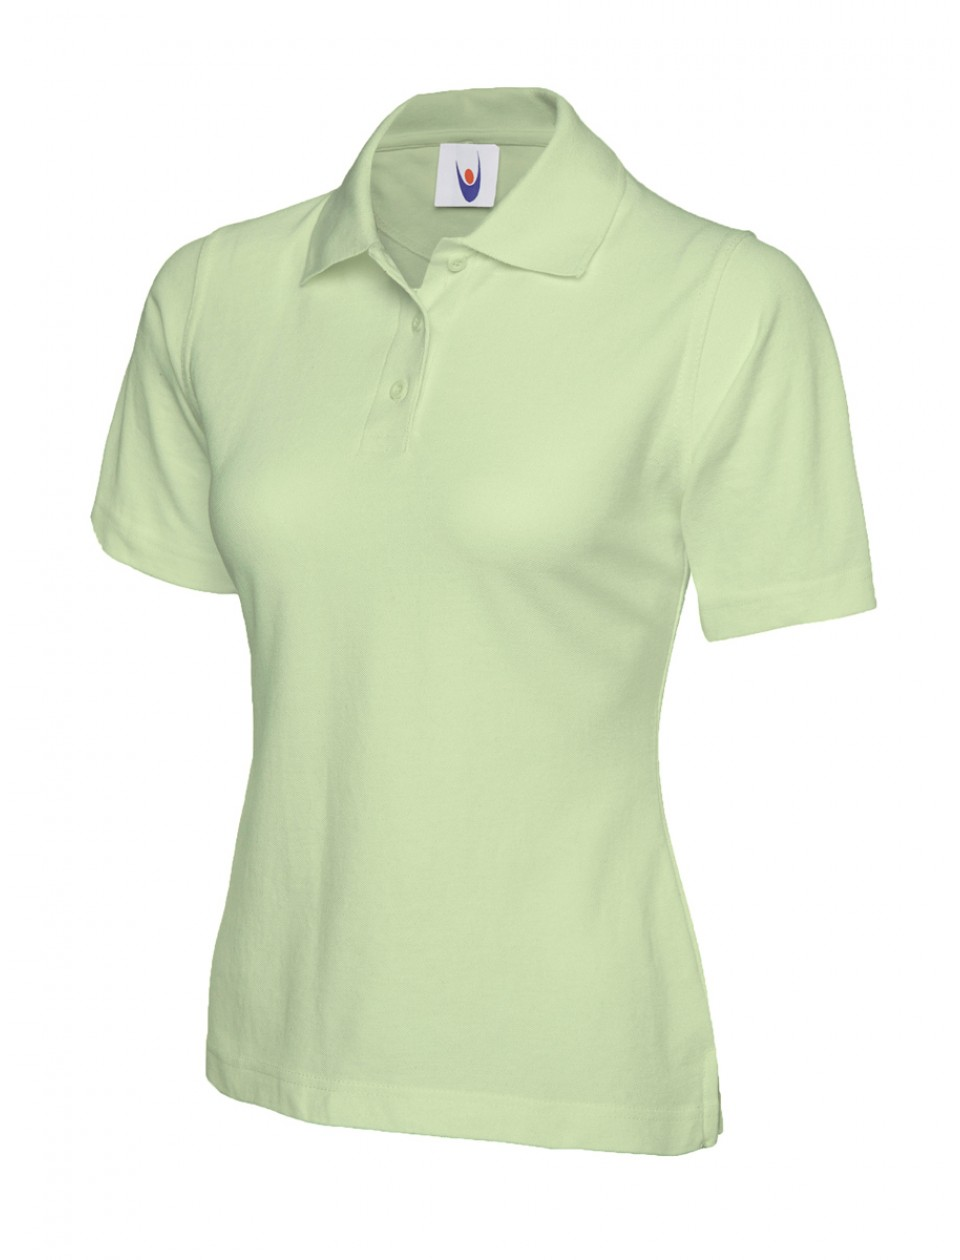 Uneek UC106 Ladies  Polycotton Polo Shirt Clothing